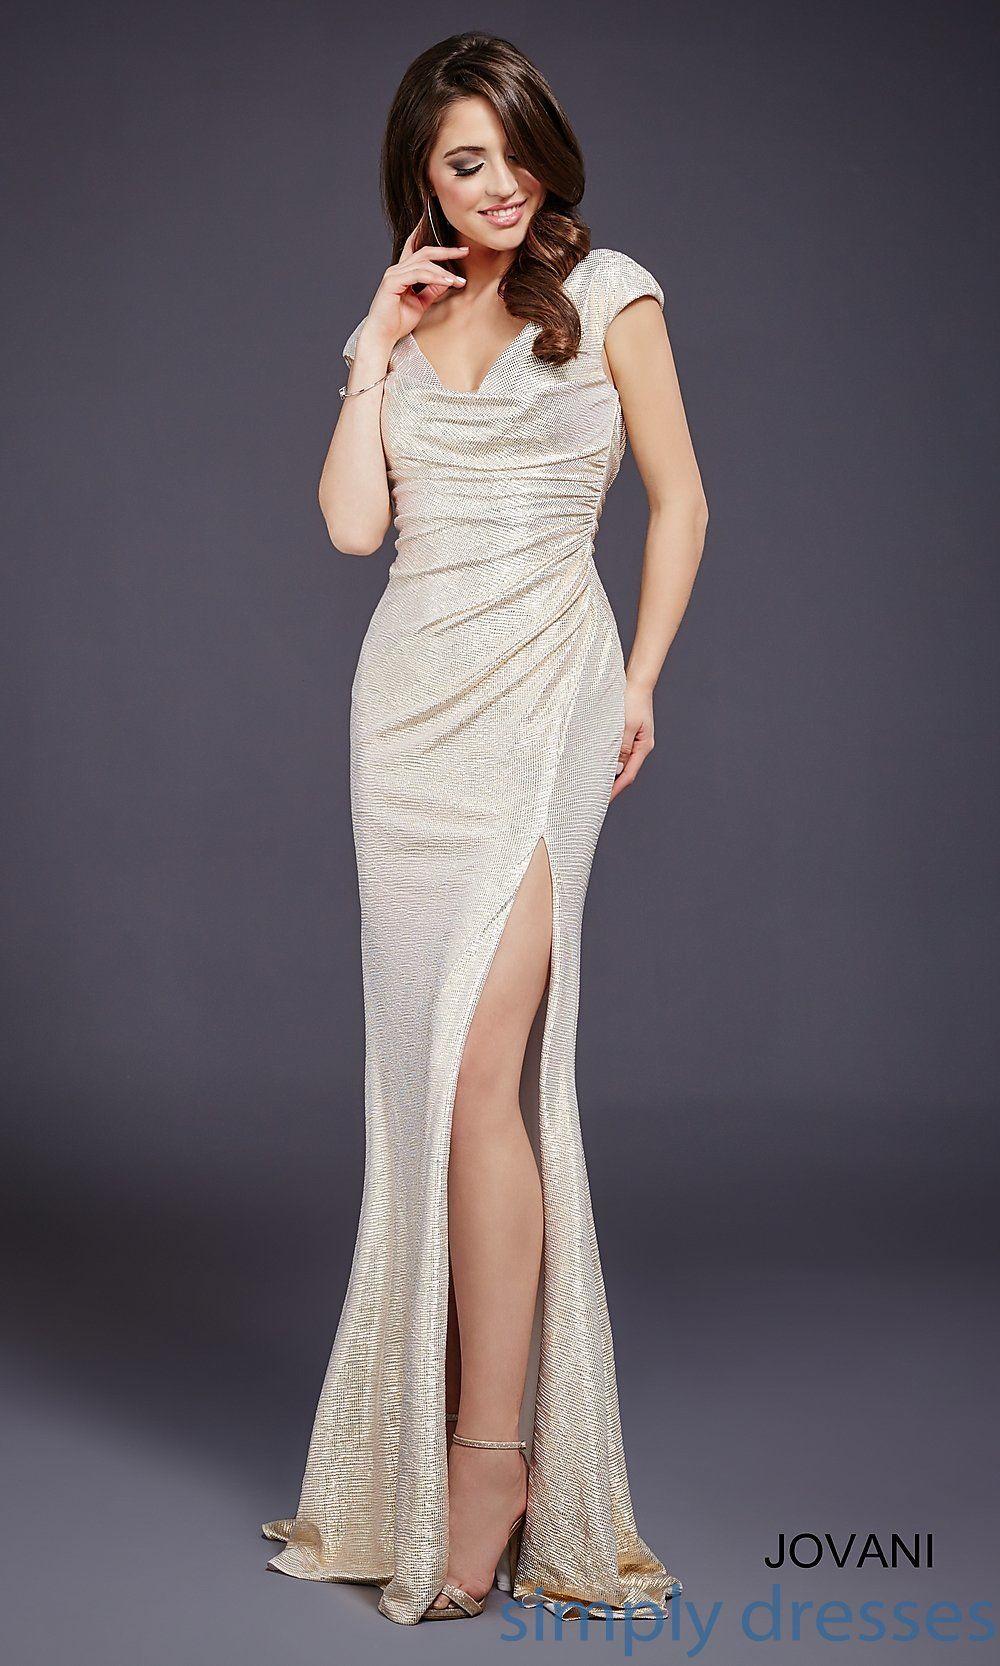 Homecoming dresses formal prom dresses evening wear jo